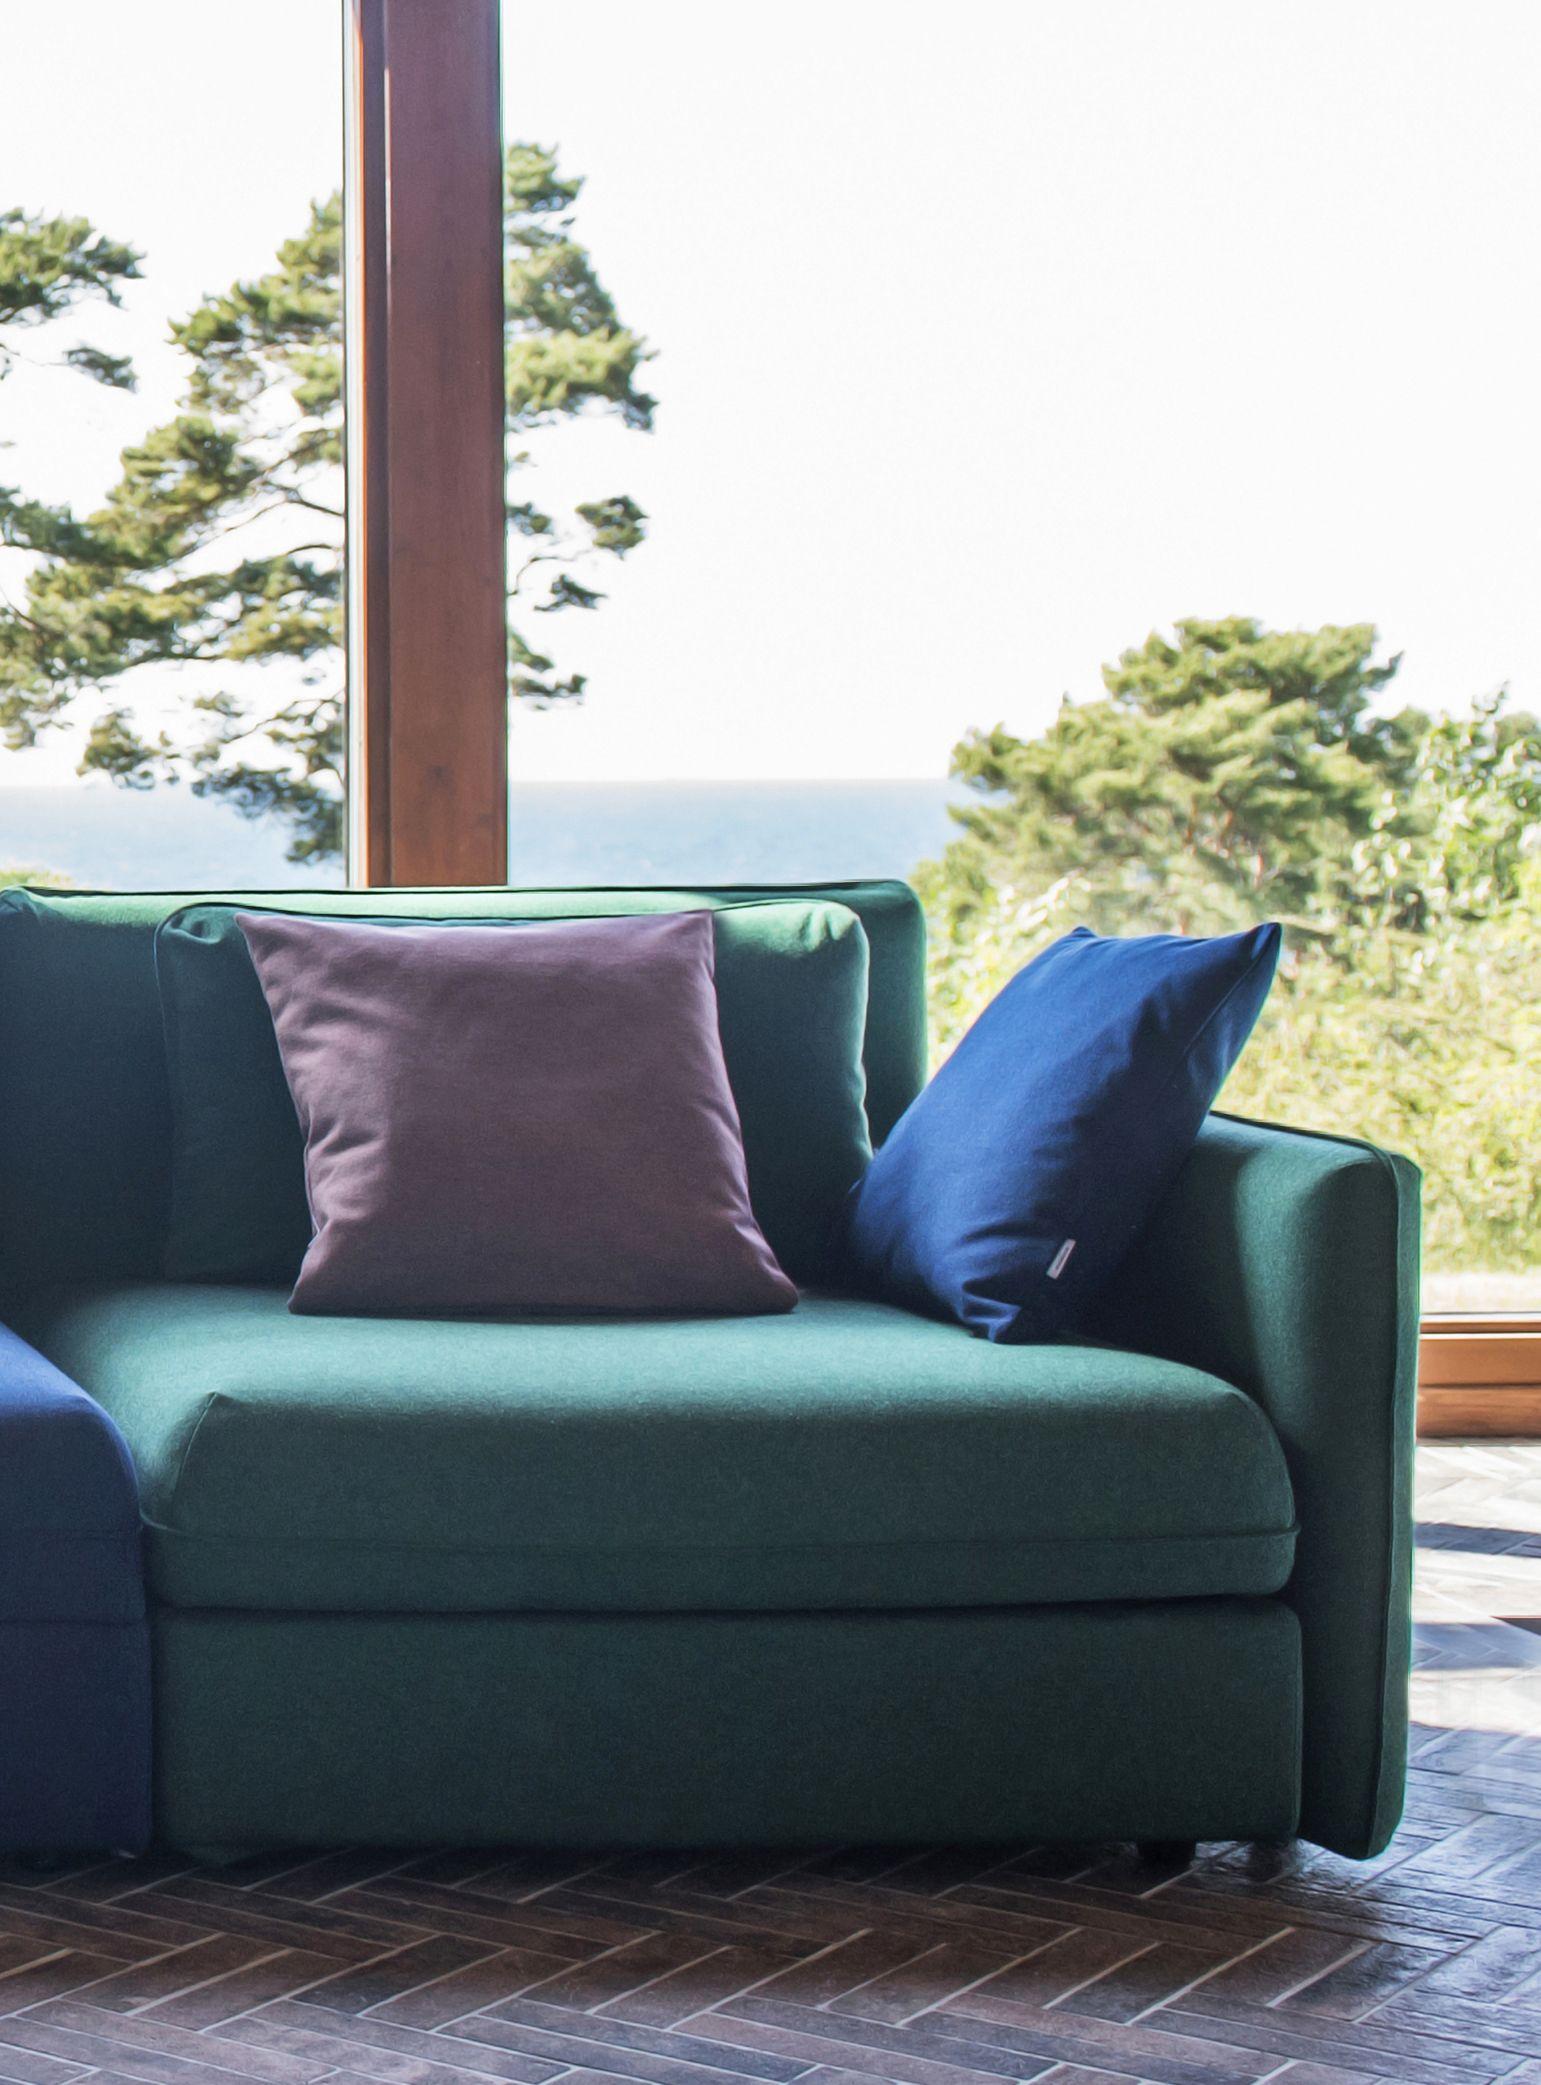 Emerald green green sofa against huge windows